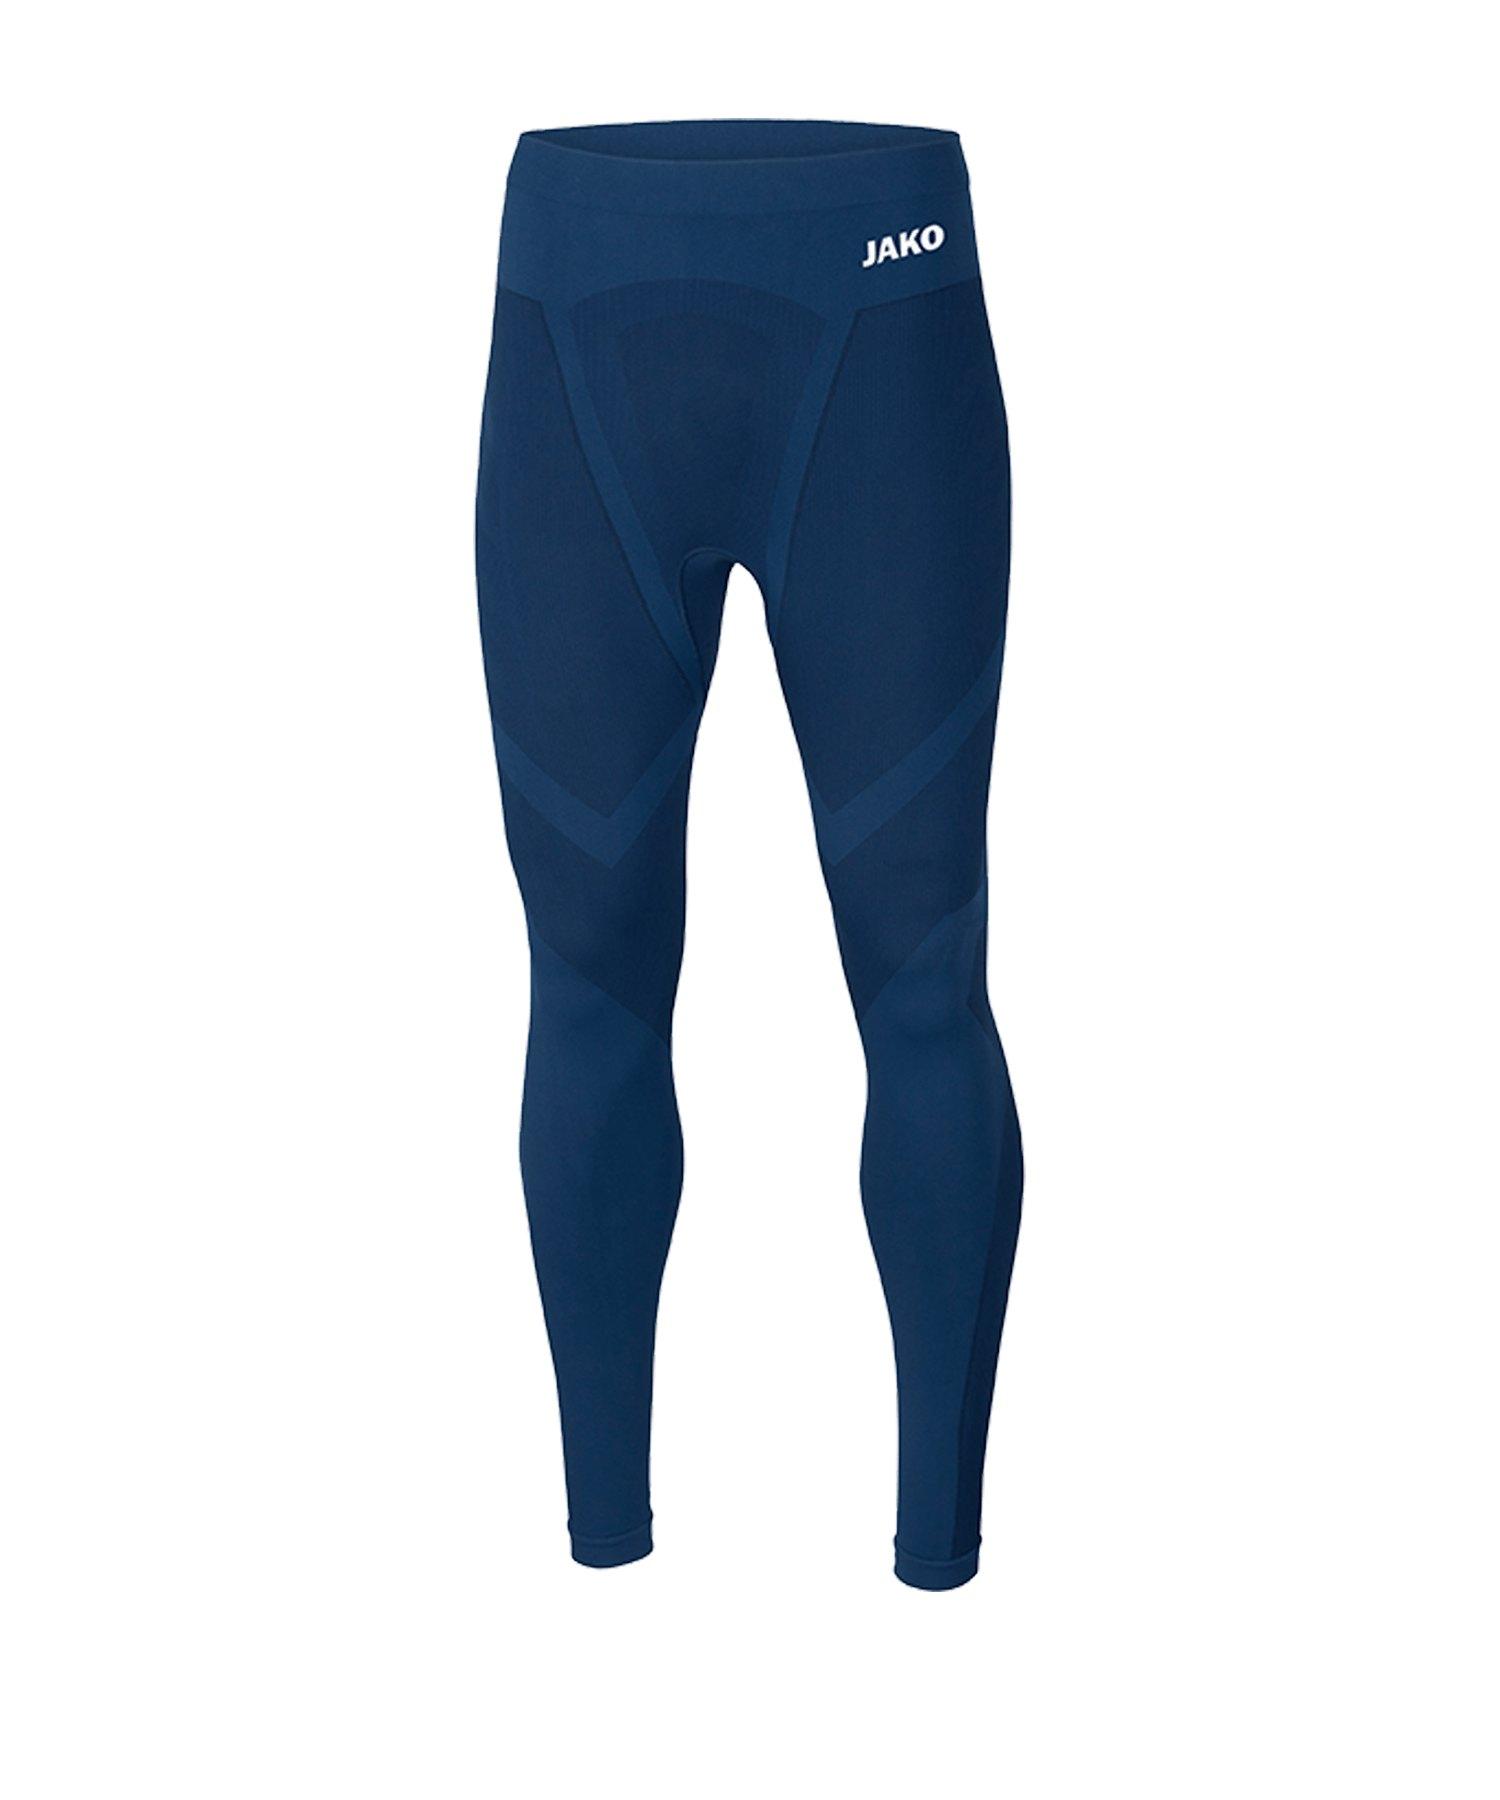 JAKO Comfort 2.0 Long Tight Blau F09 - blau